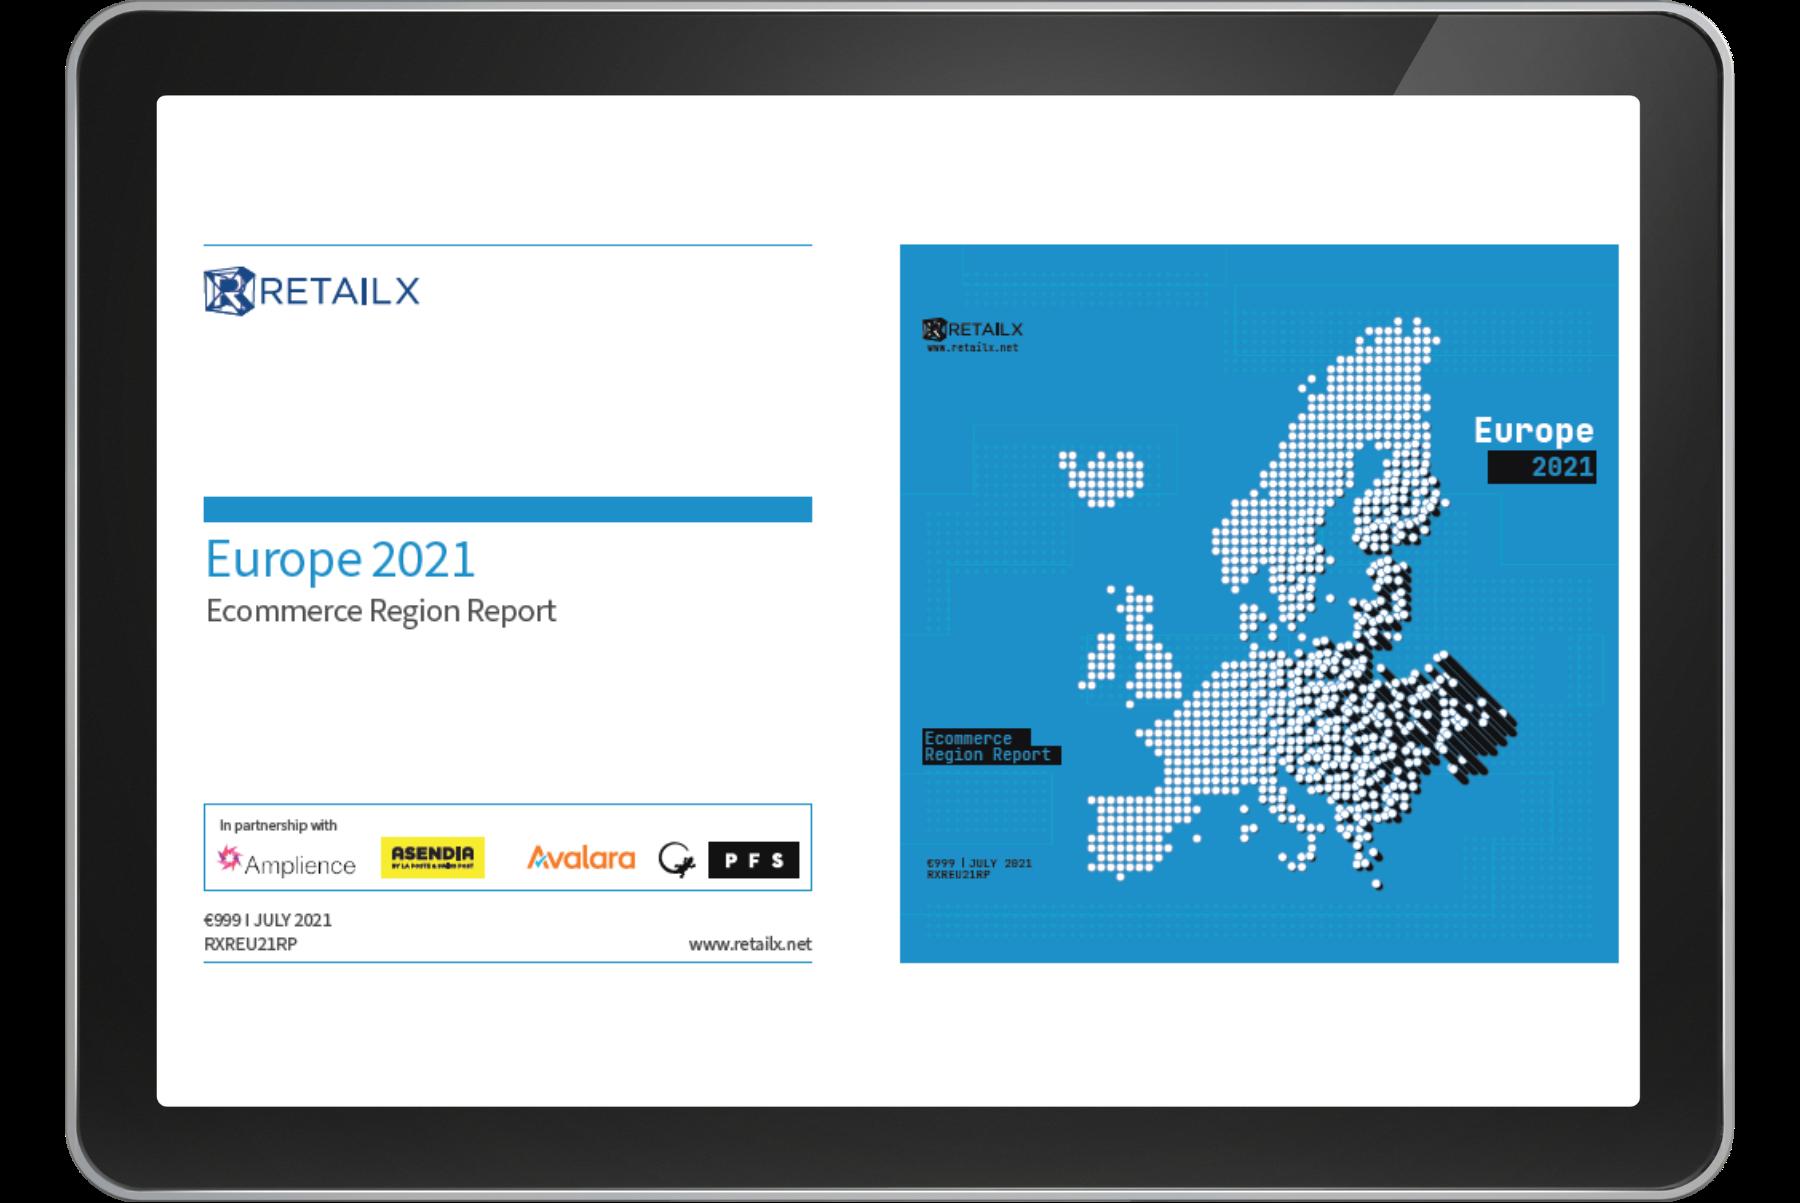 Europe 2021 e-commerce region report